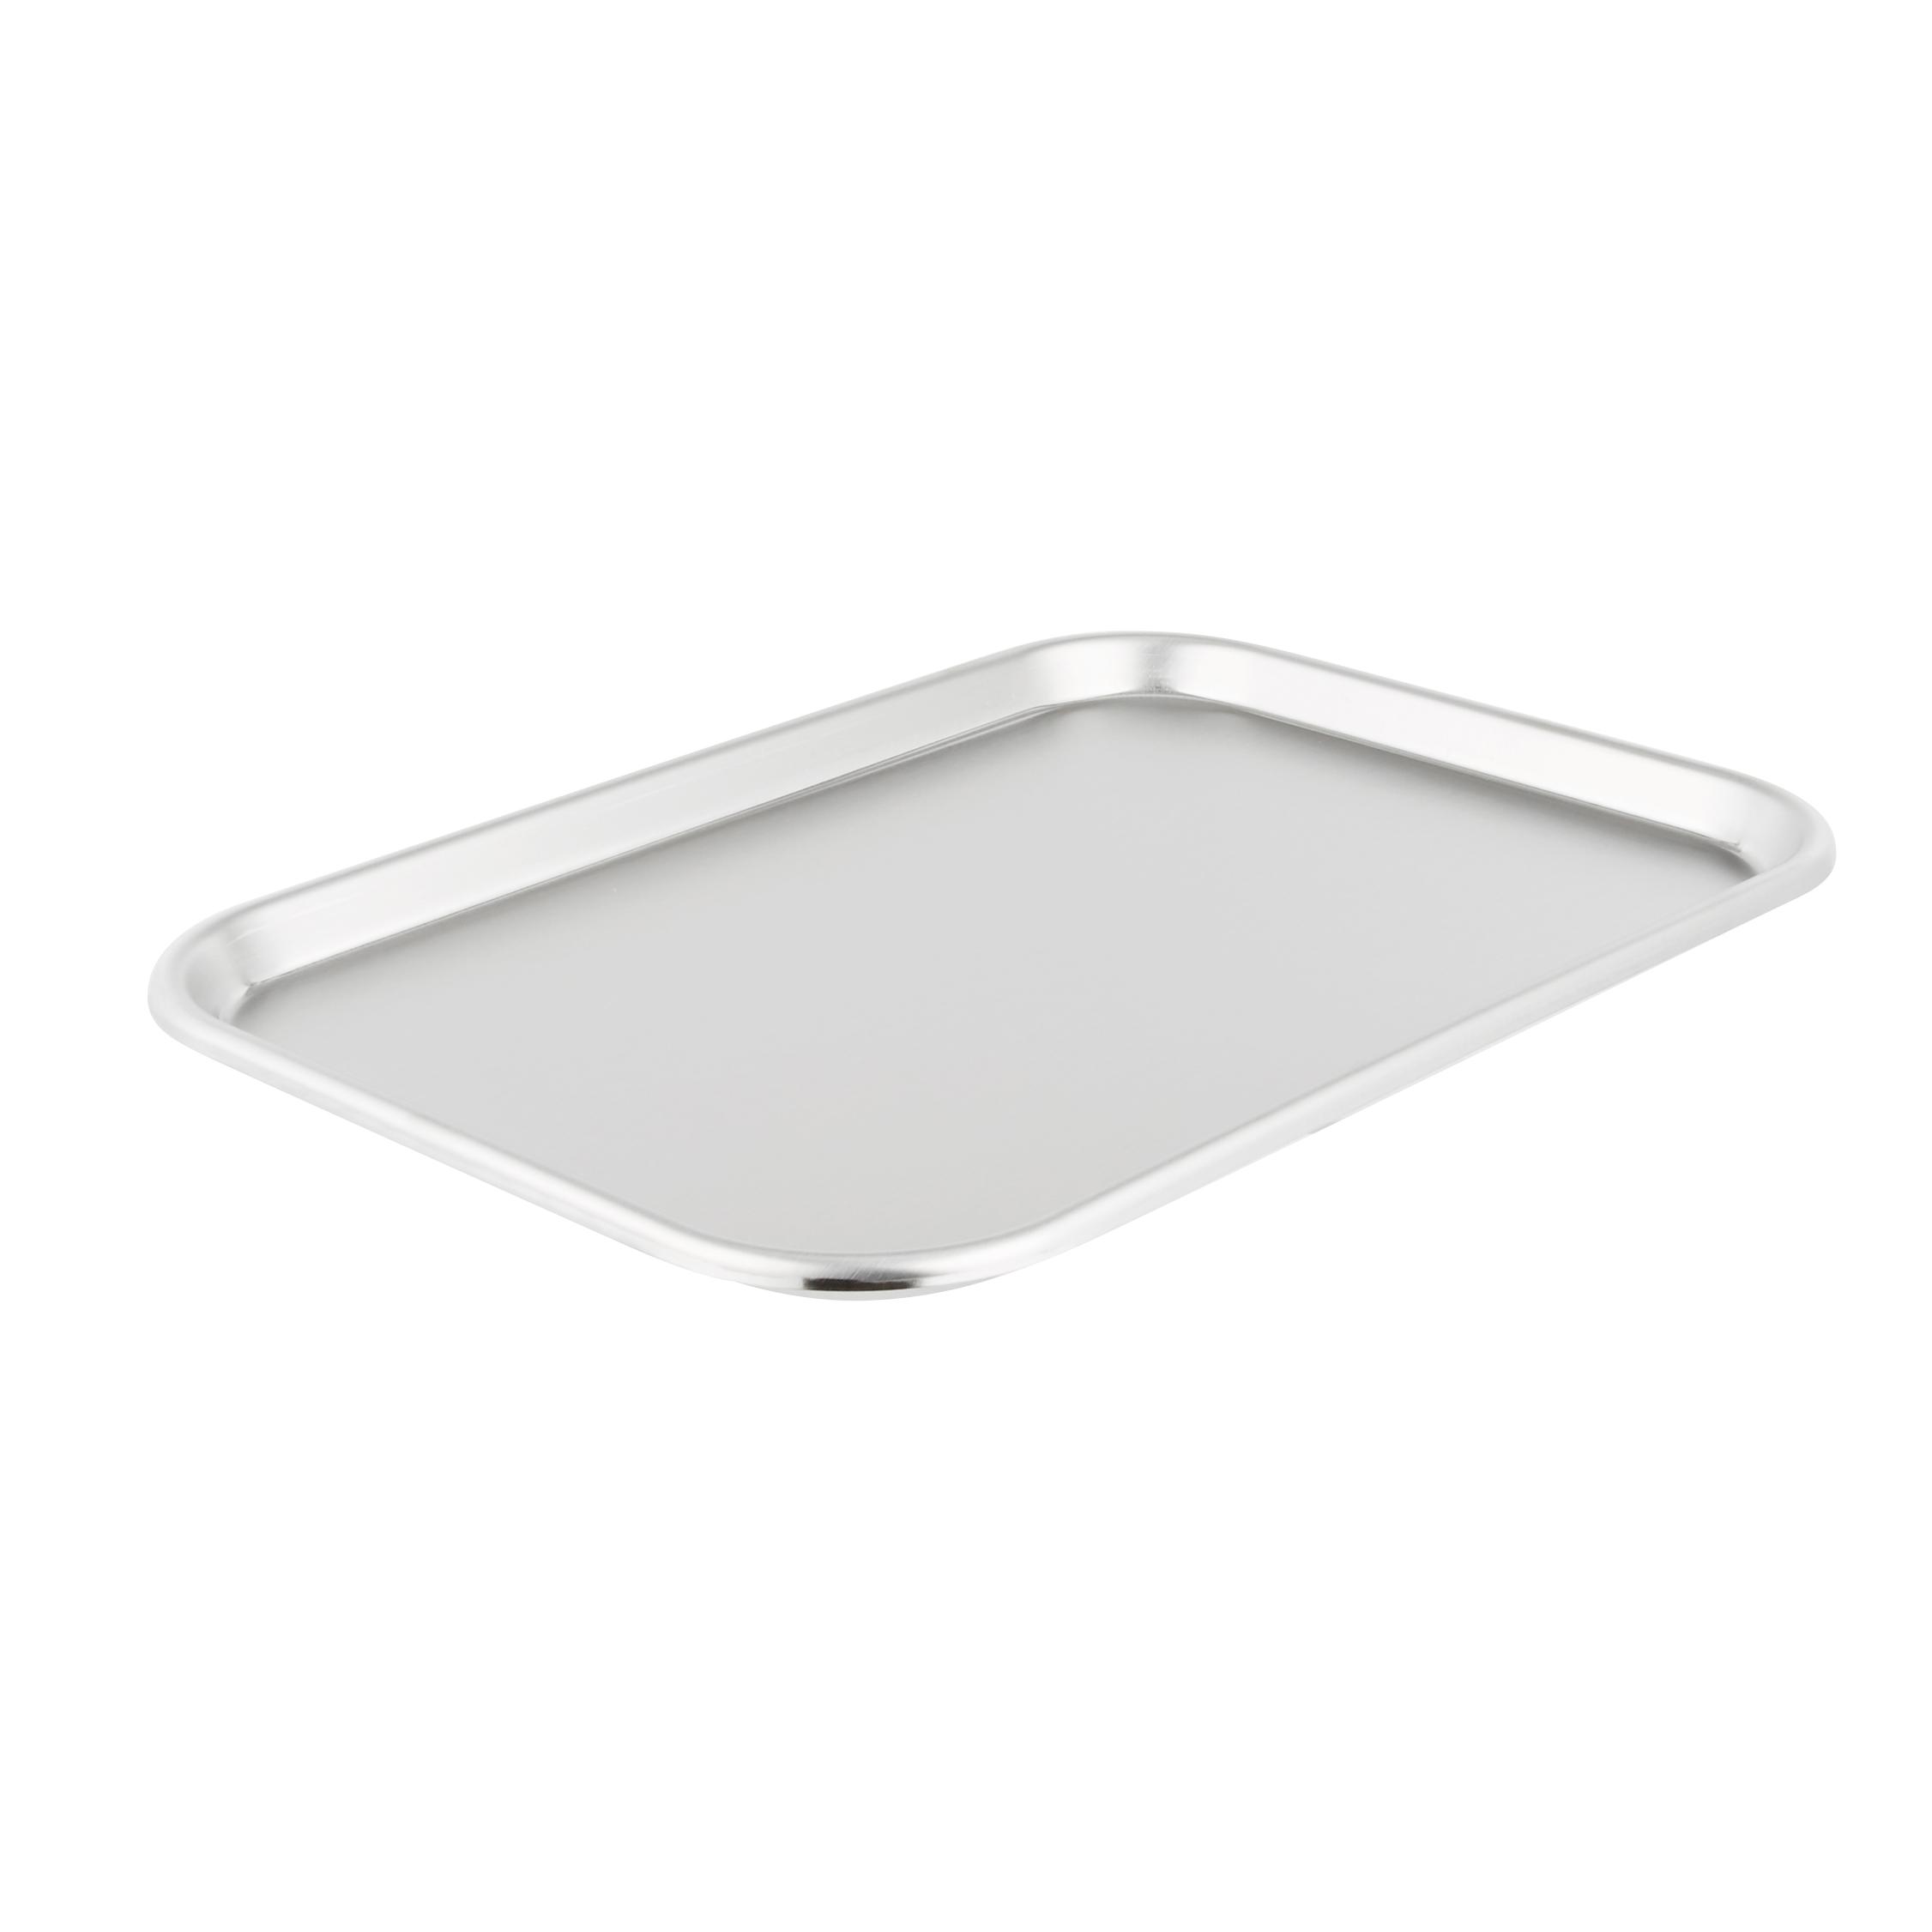 Vollrath 80190 serving & display tray, metal